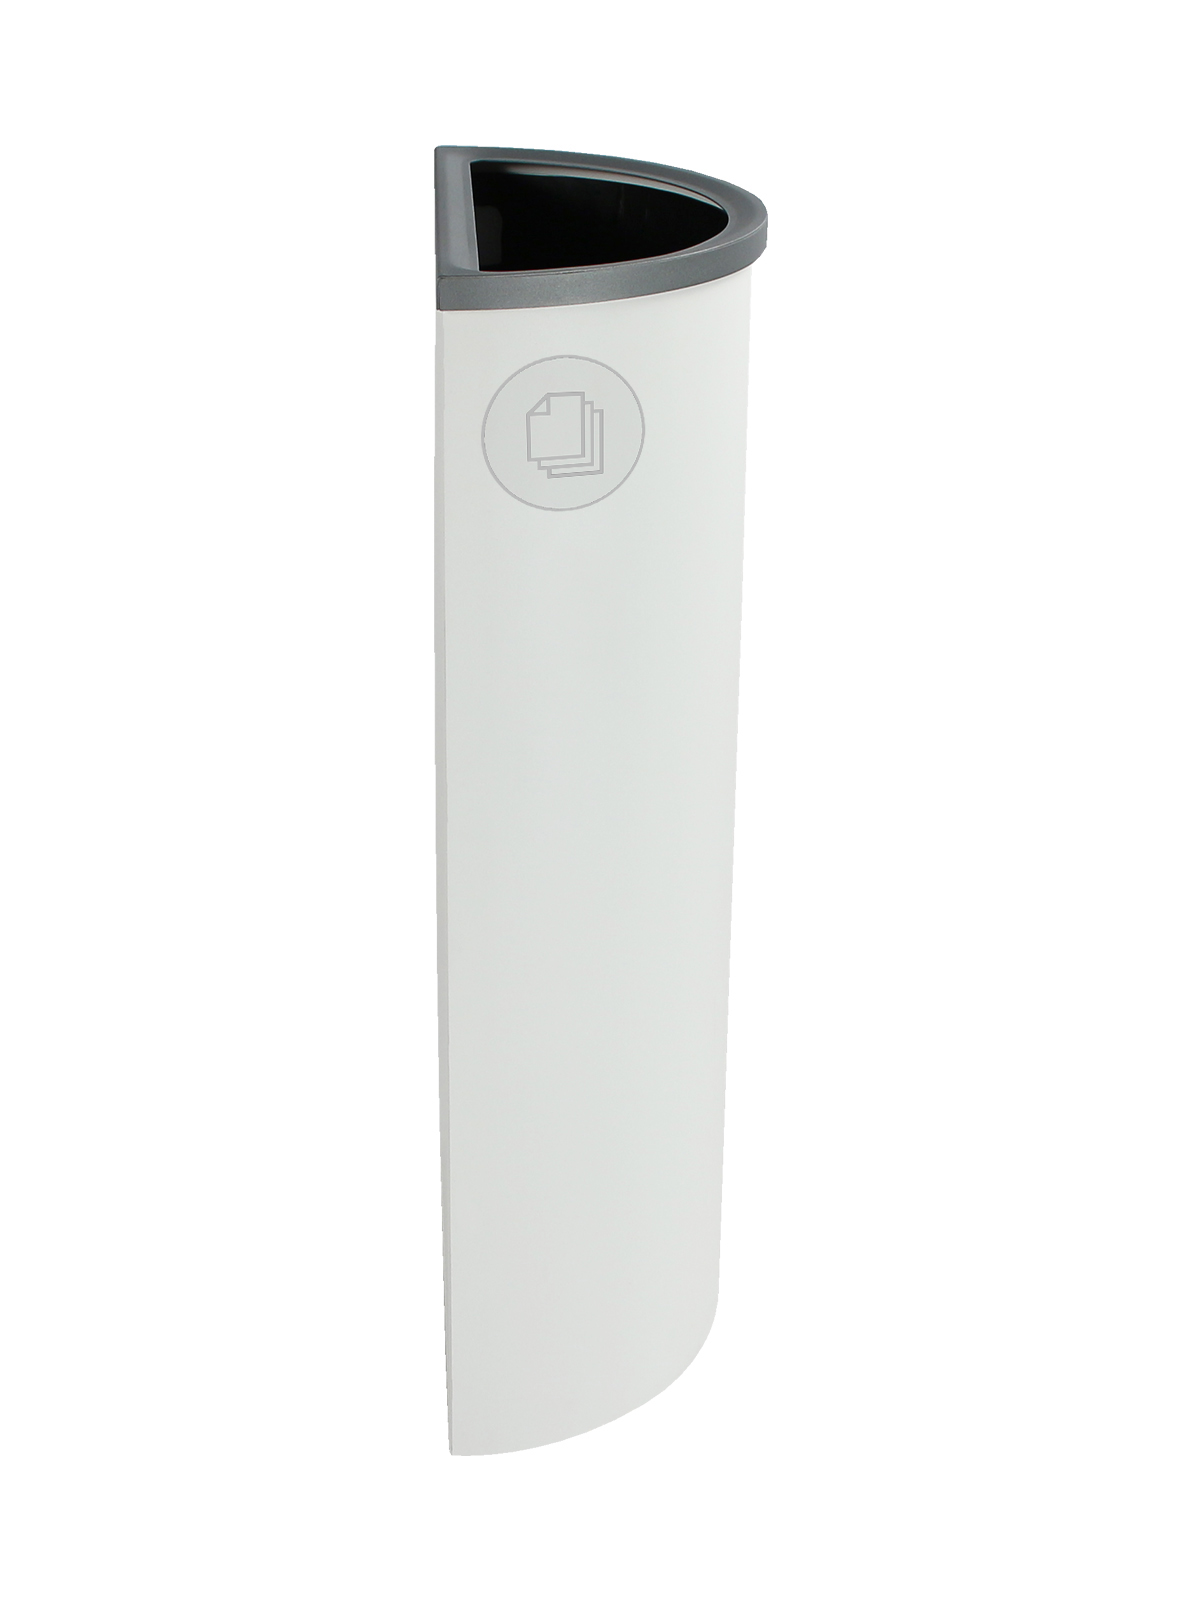 SPECTRUM - Single - Ellipse Slim - Paper - Full - White